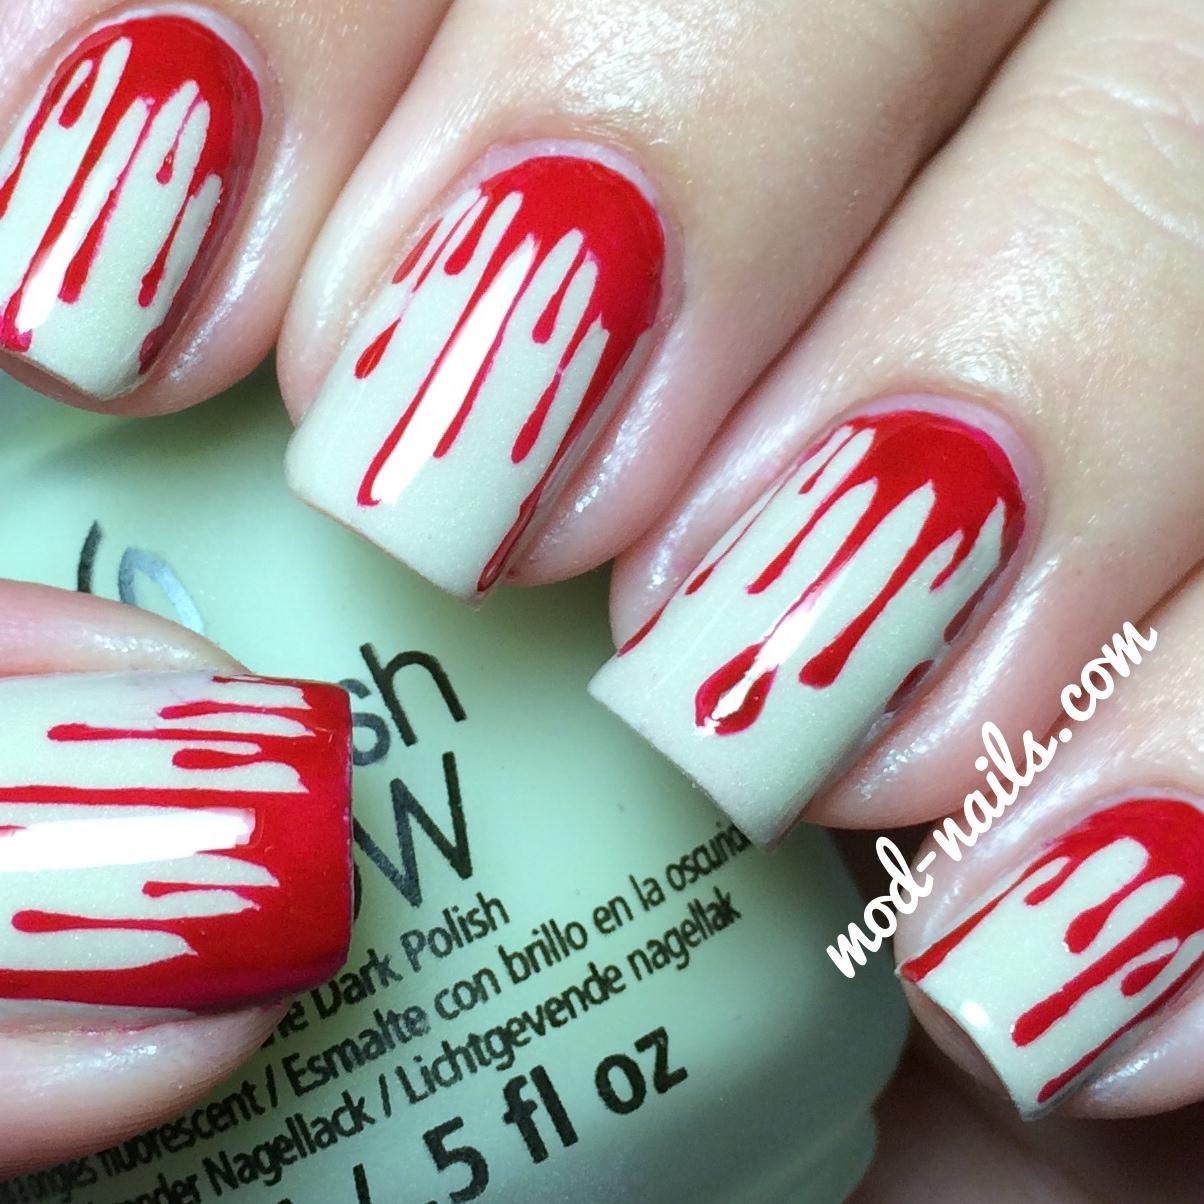 blood drip glow in the dark halloween nails - Blood For Halloween